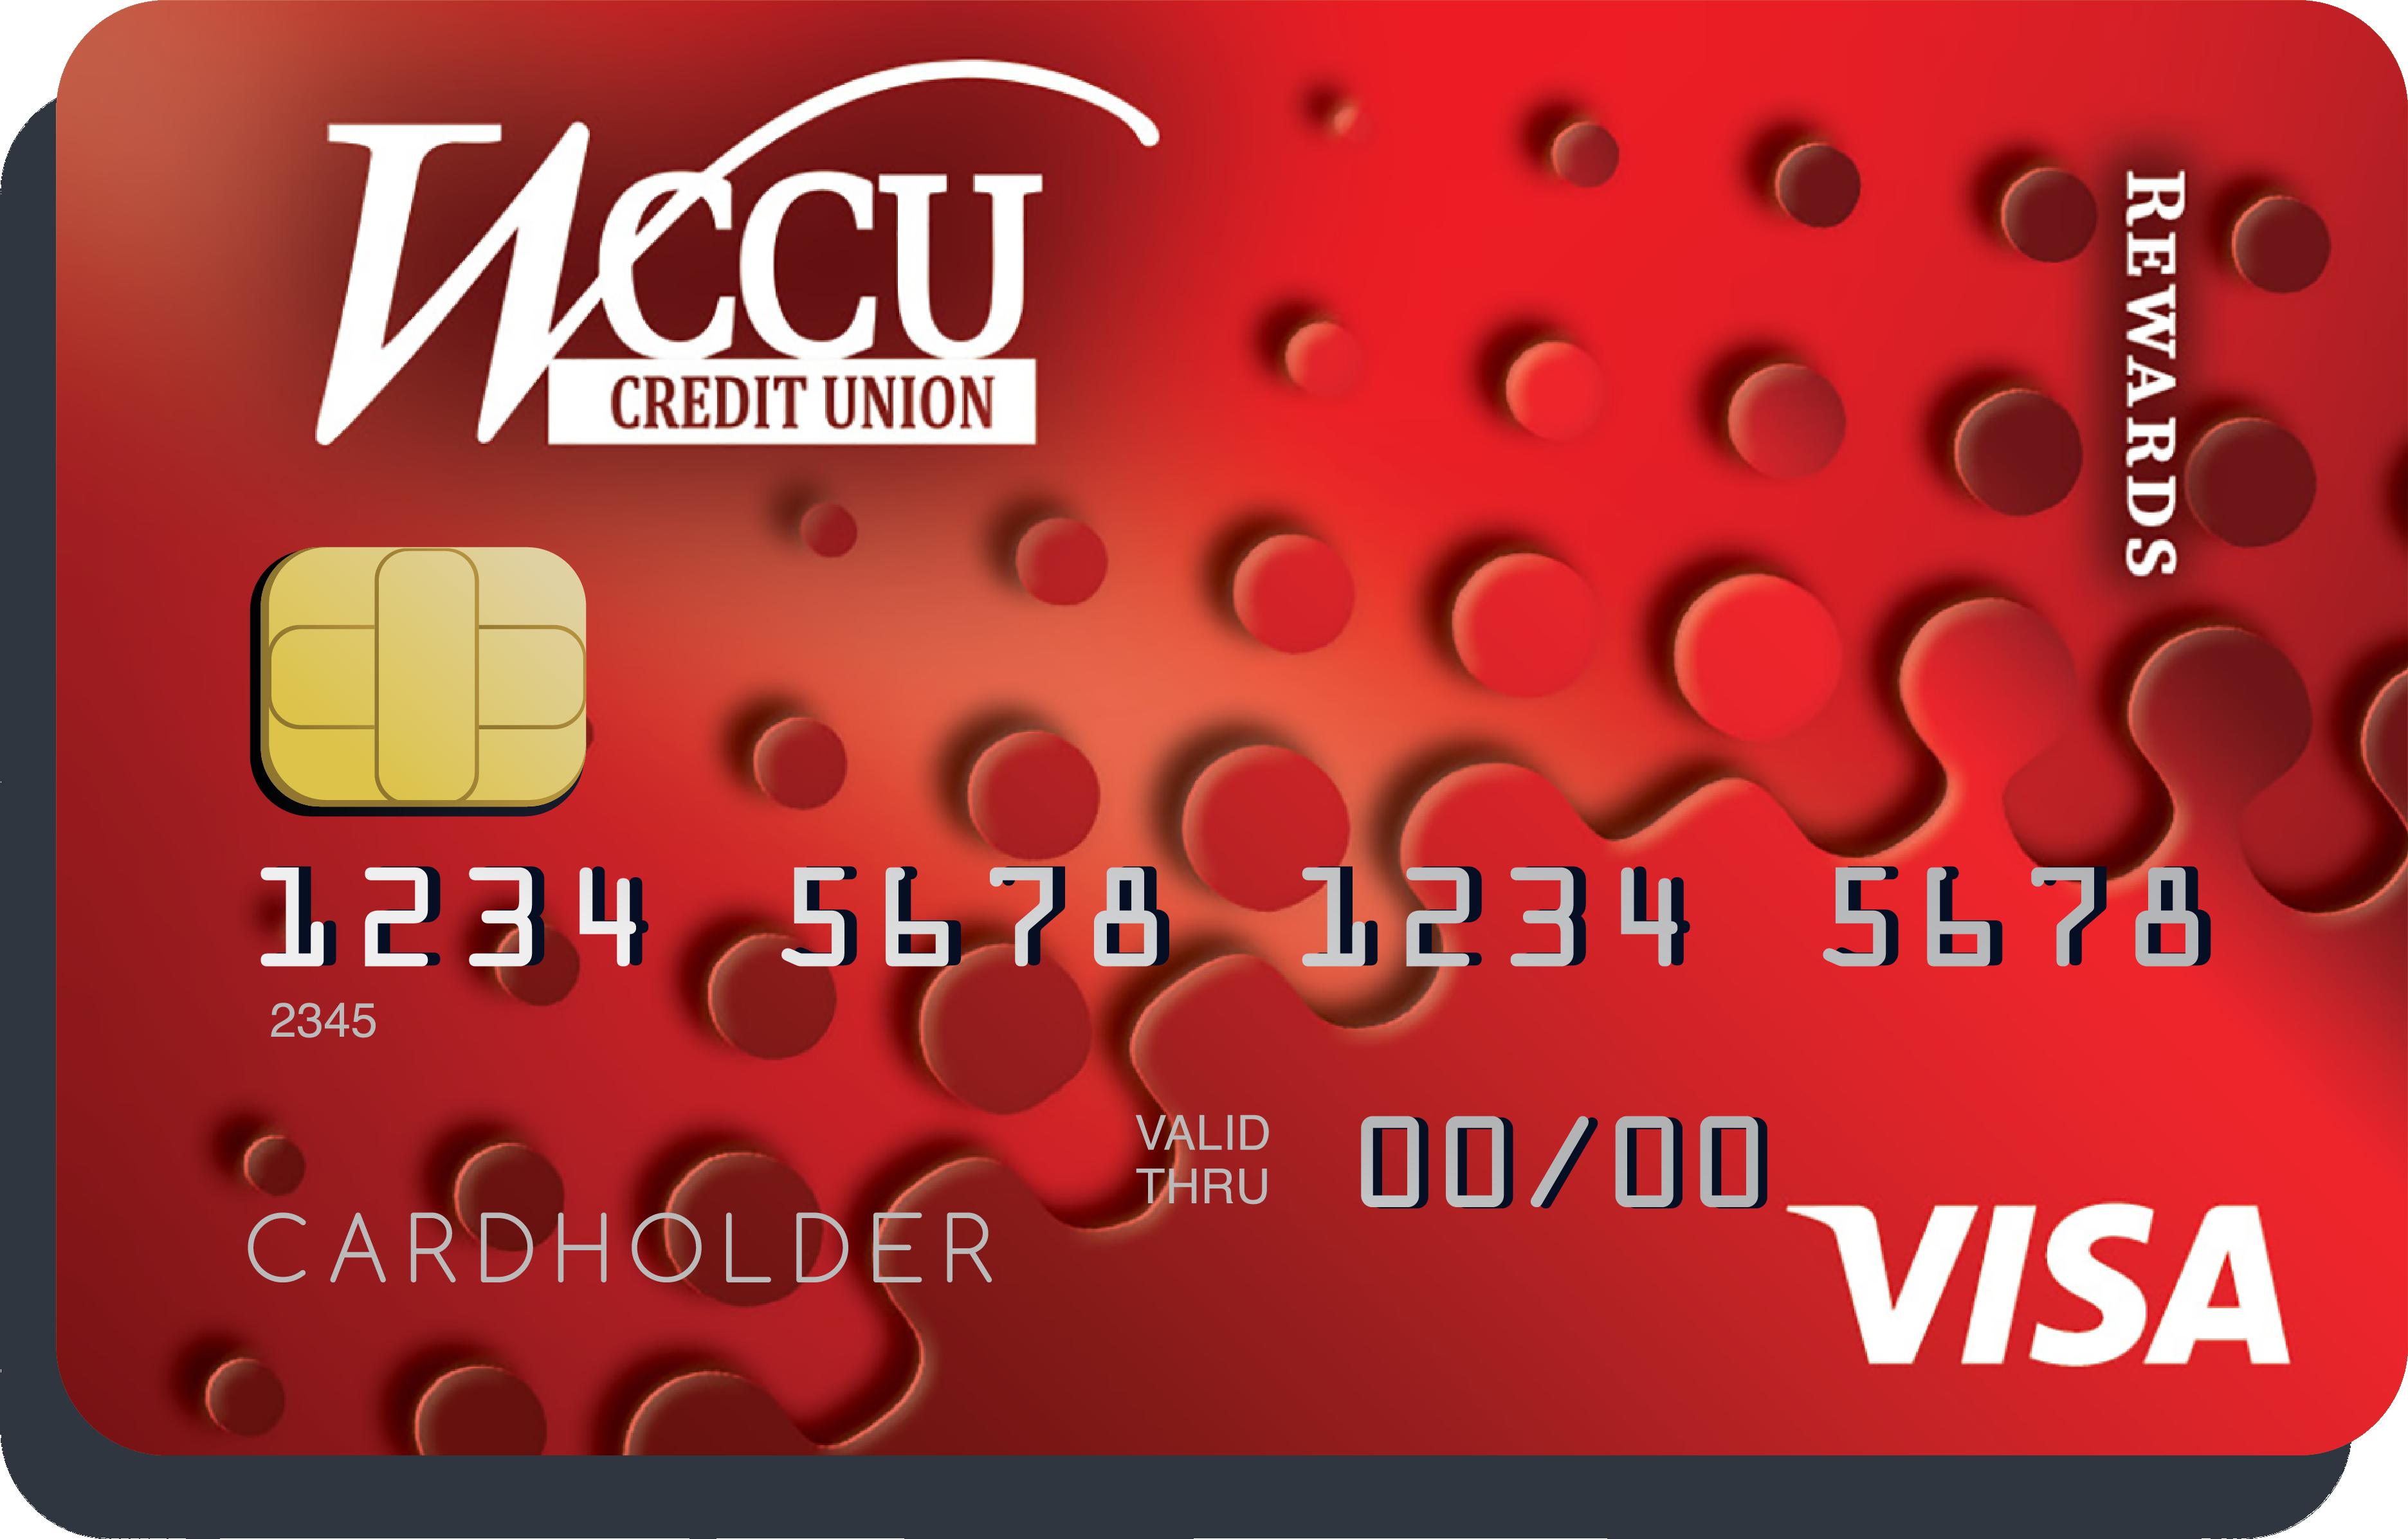 WCCU Ruby Rewards Visa Credit Card